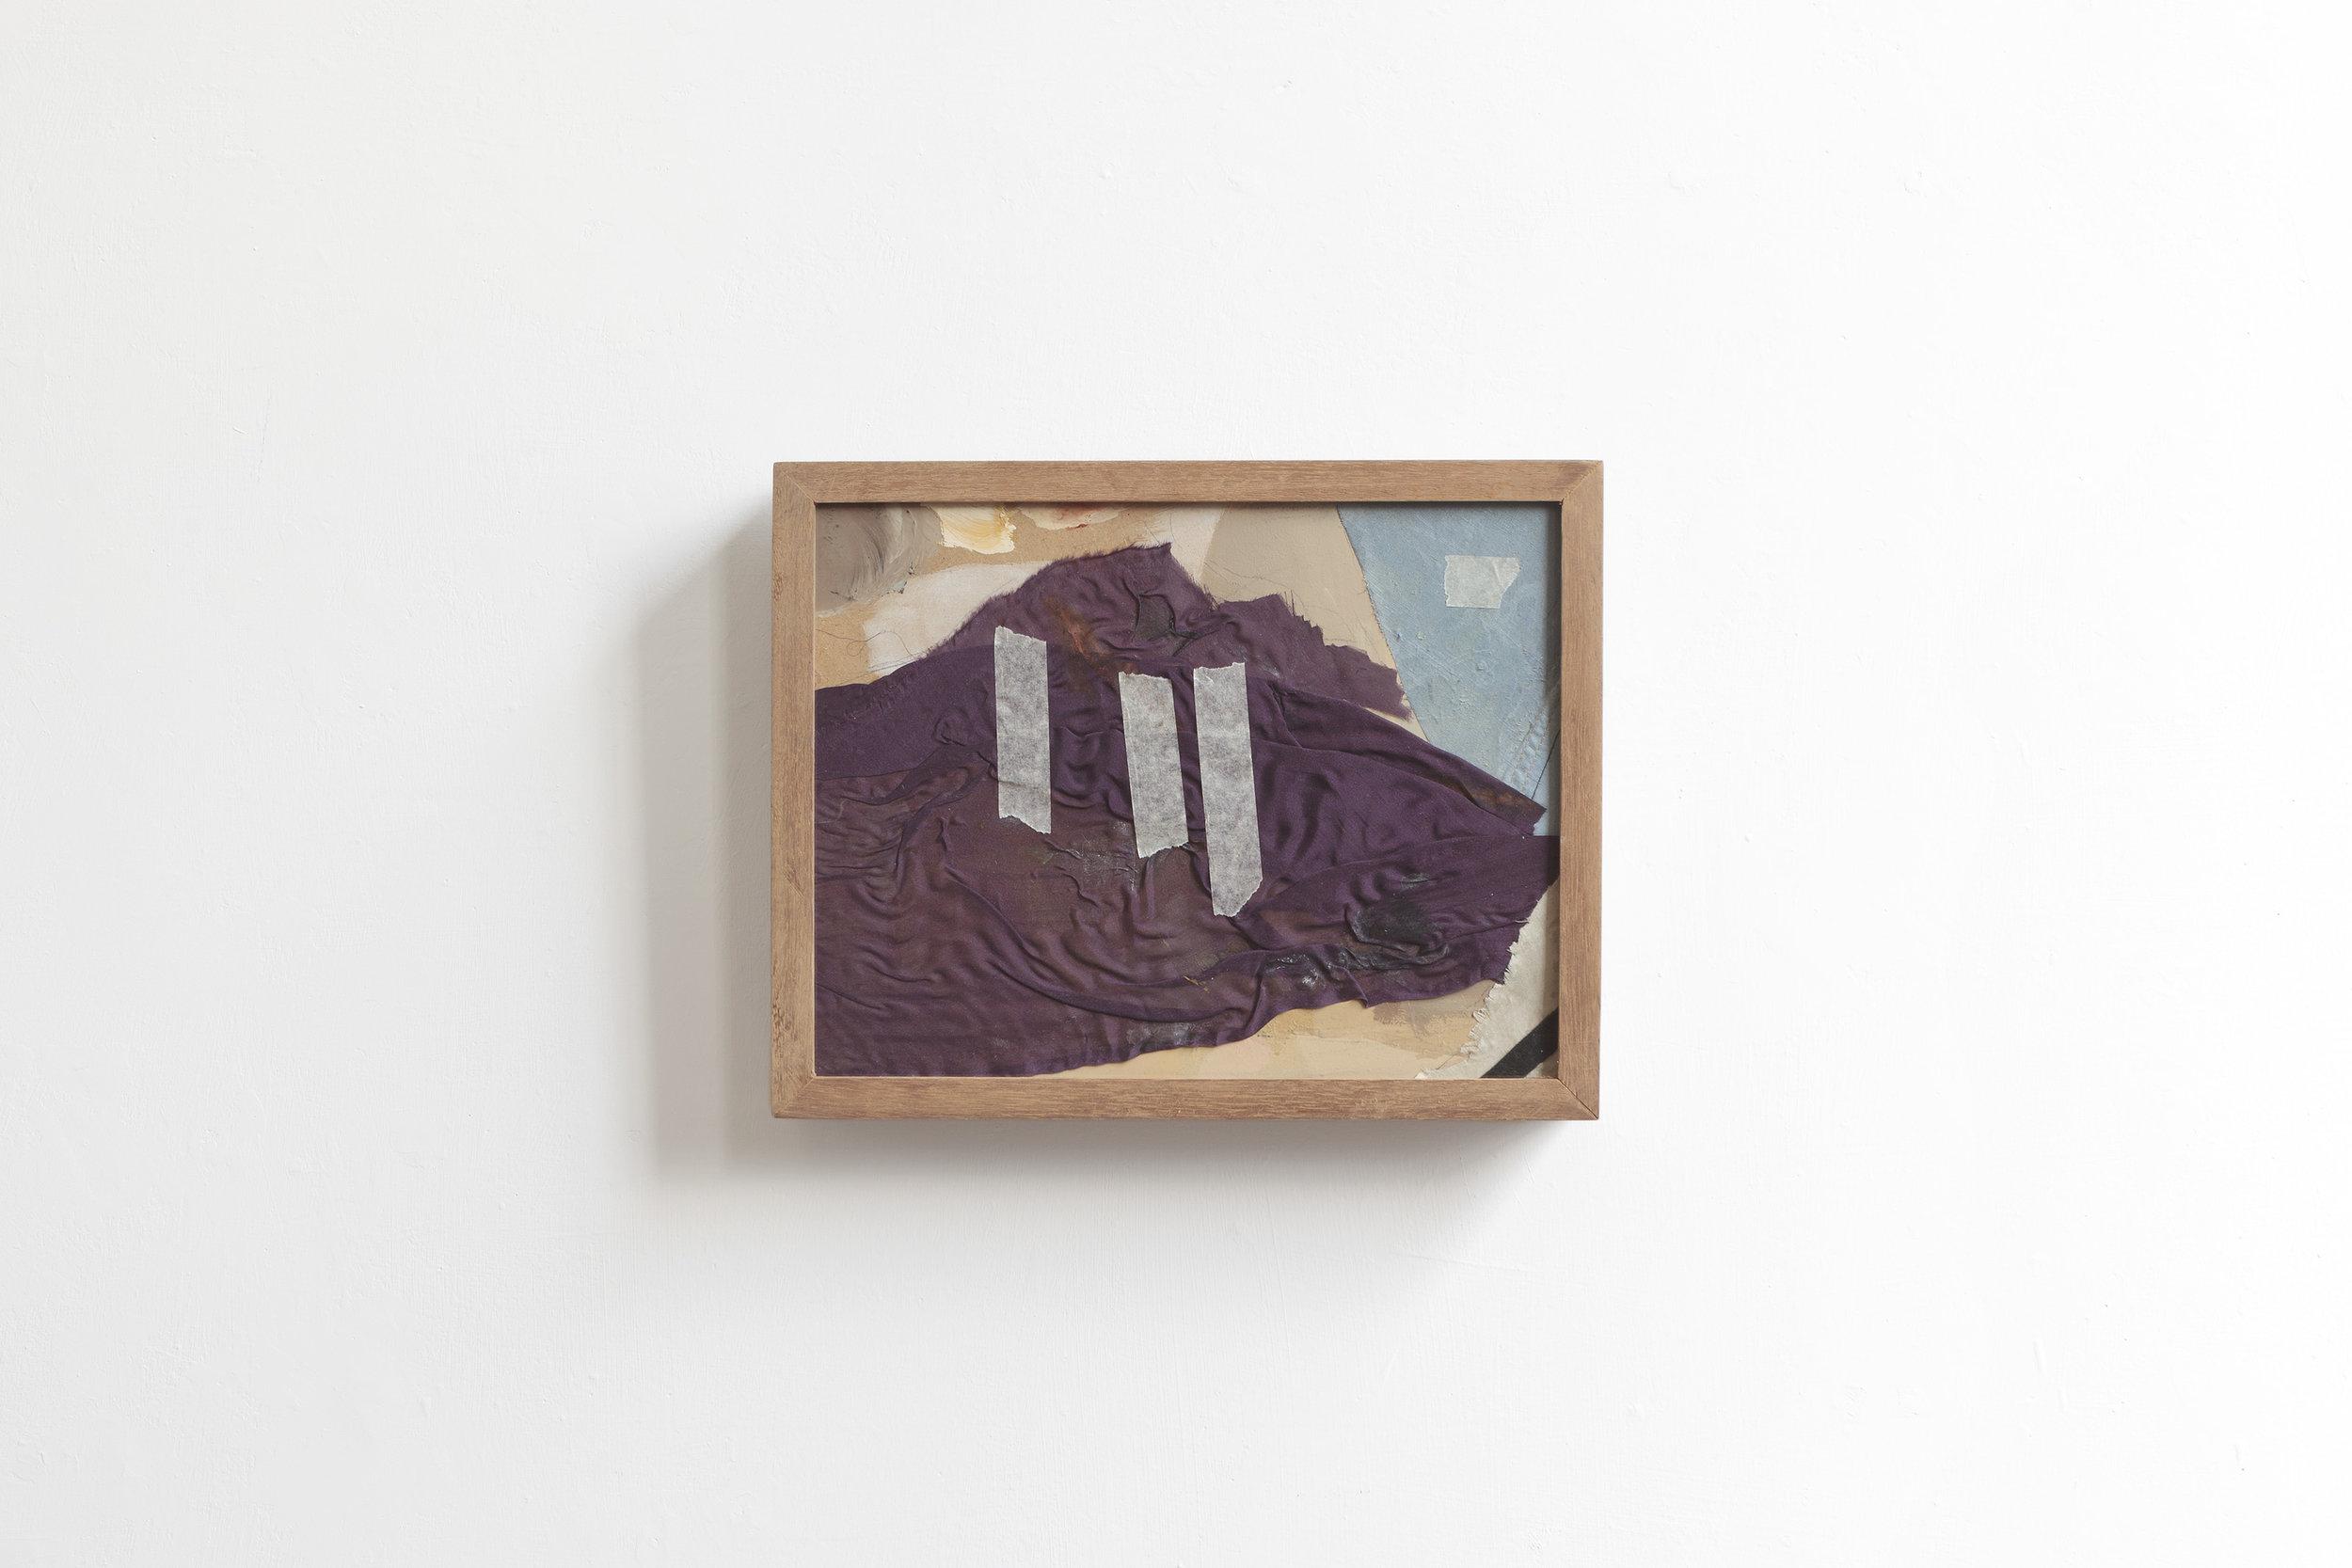 Deus  2017 - painting on wood, fabric and scotch - cm 24x30x5